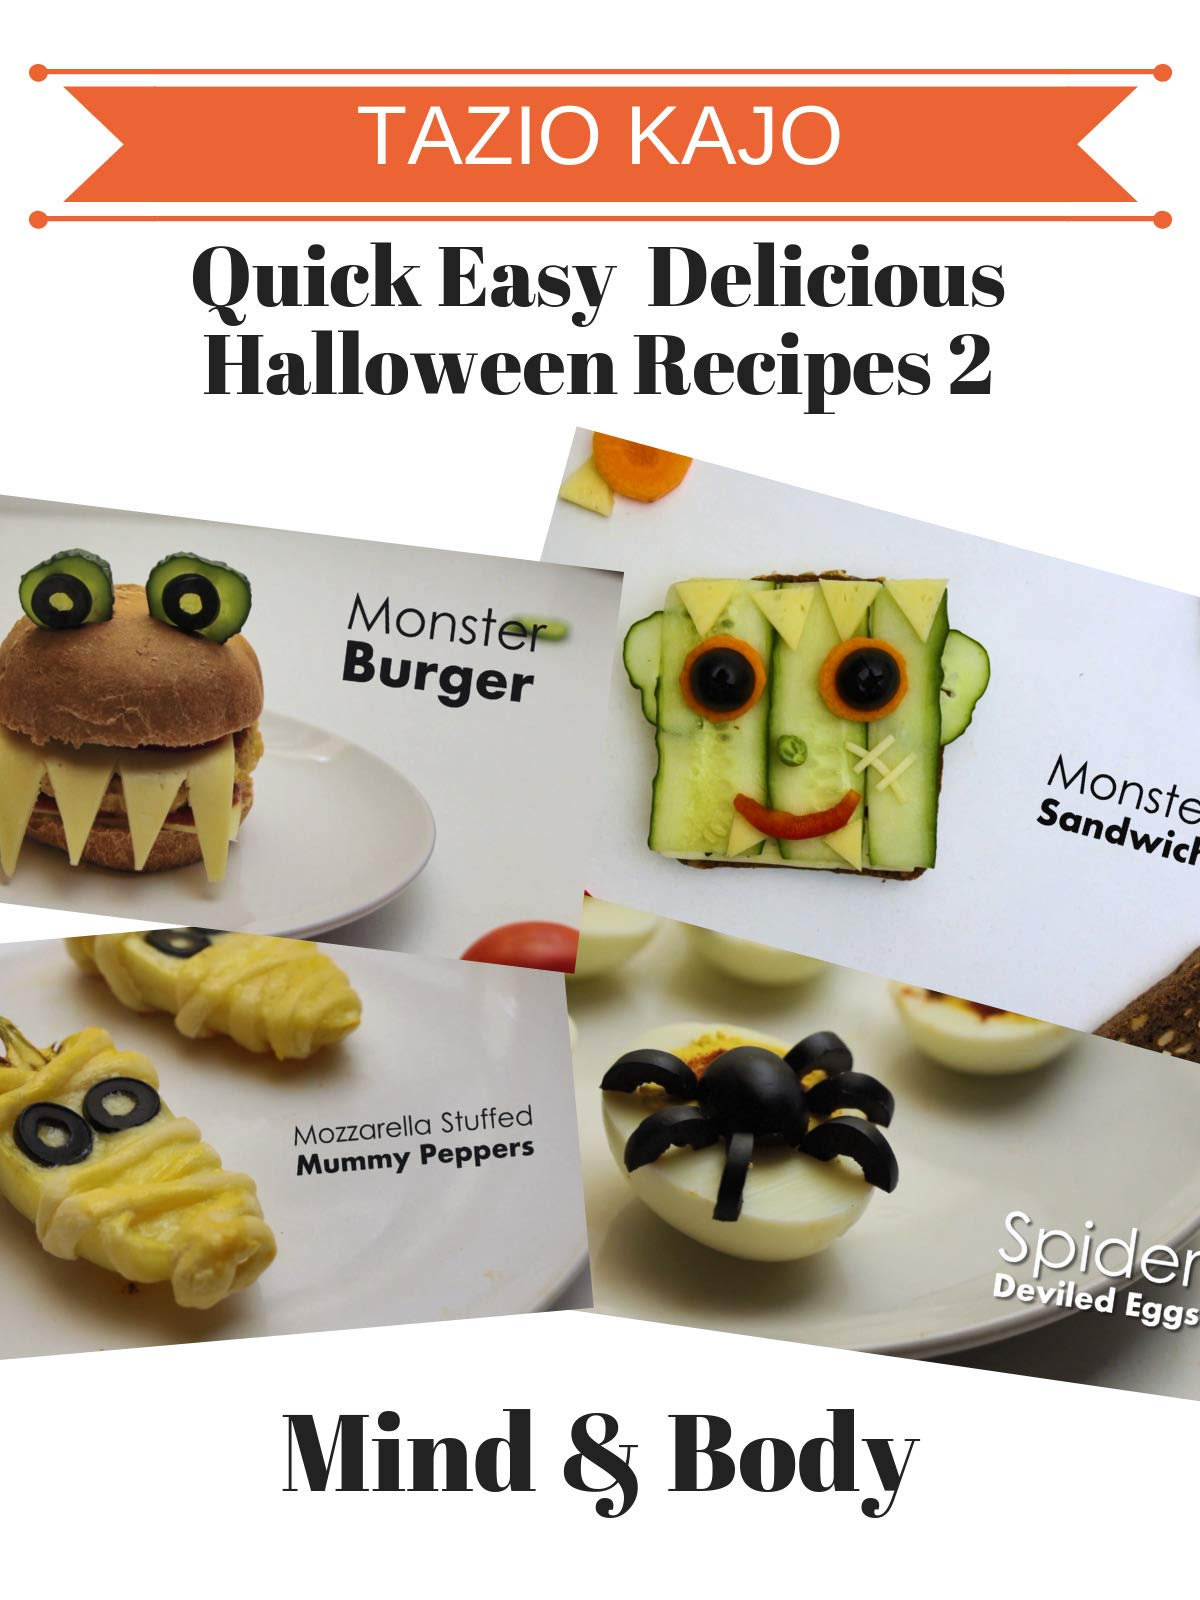 Quick Easy & Delicious Halloween Recipes 2